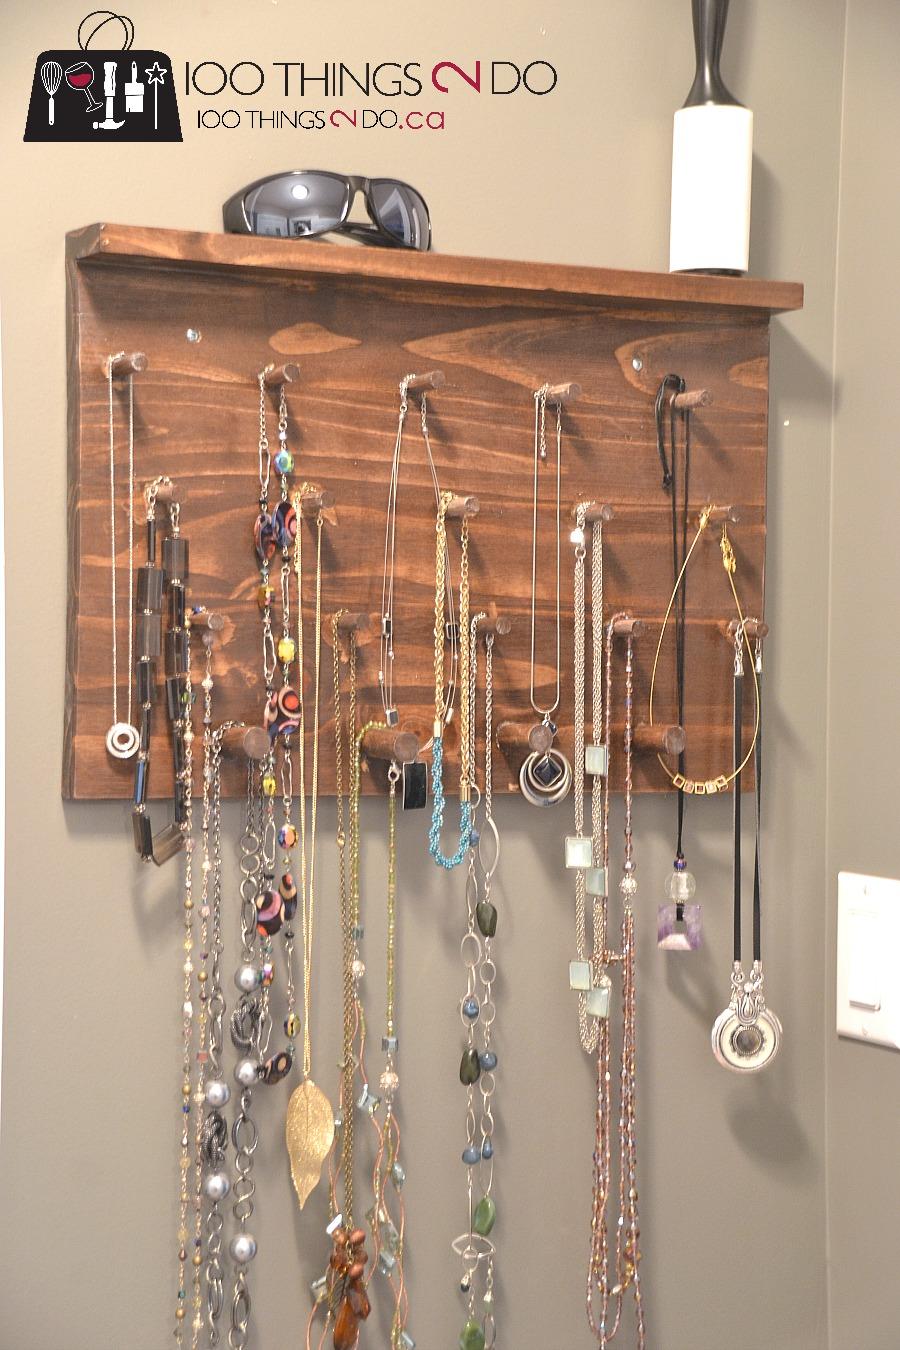 DIY Tie Rack, gifts for him, tie rack, easy tie rack, DIY jewelry rack, DIY jewellery rack, necklace holder